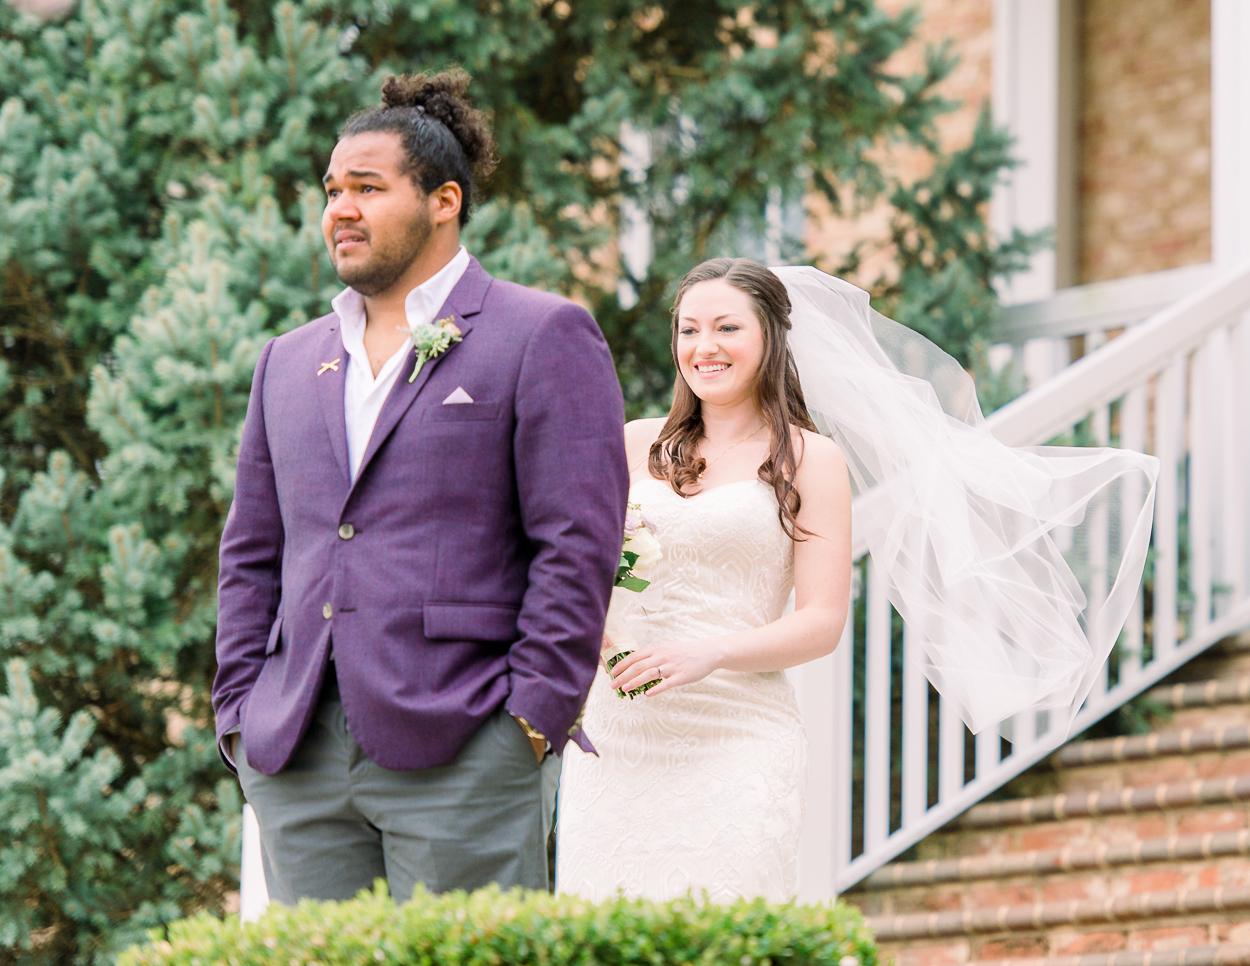 BigCork_vineyard wedding_virginiaweddingphotographer_youseephotography_SarahJames (46).JPG